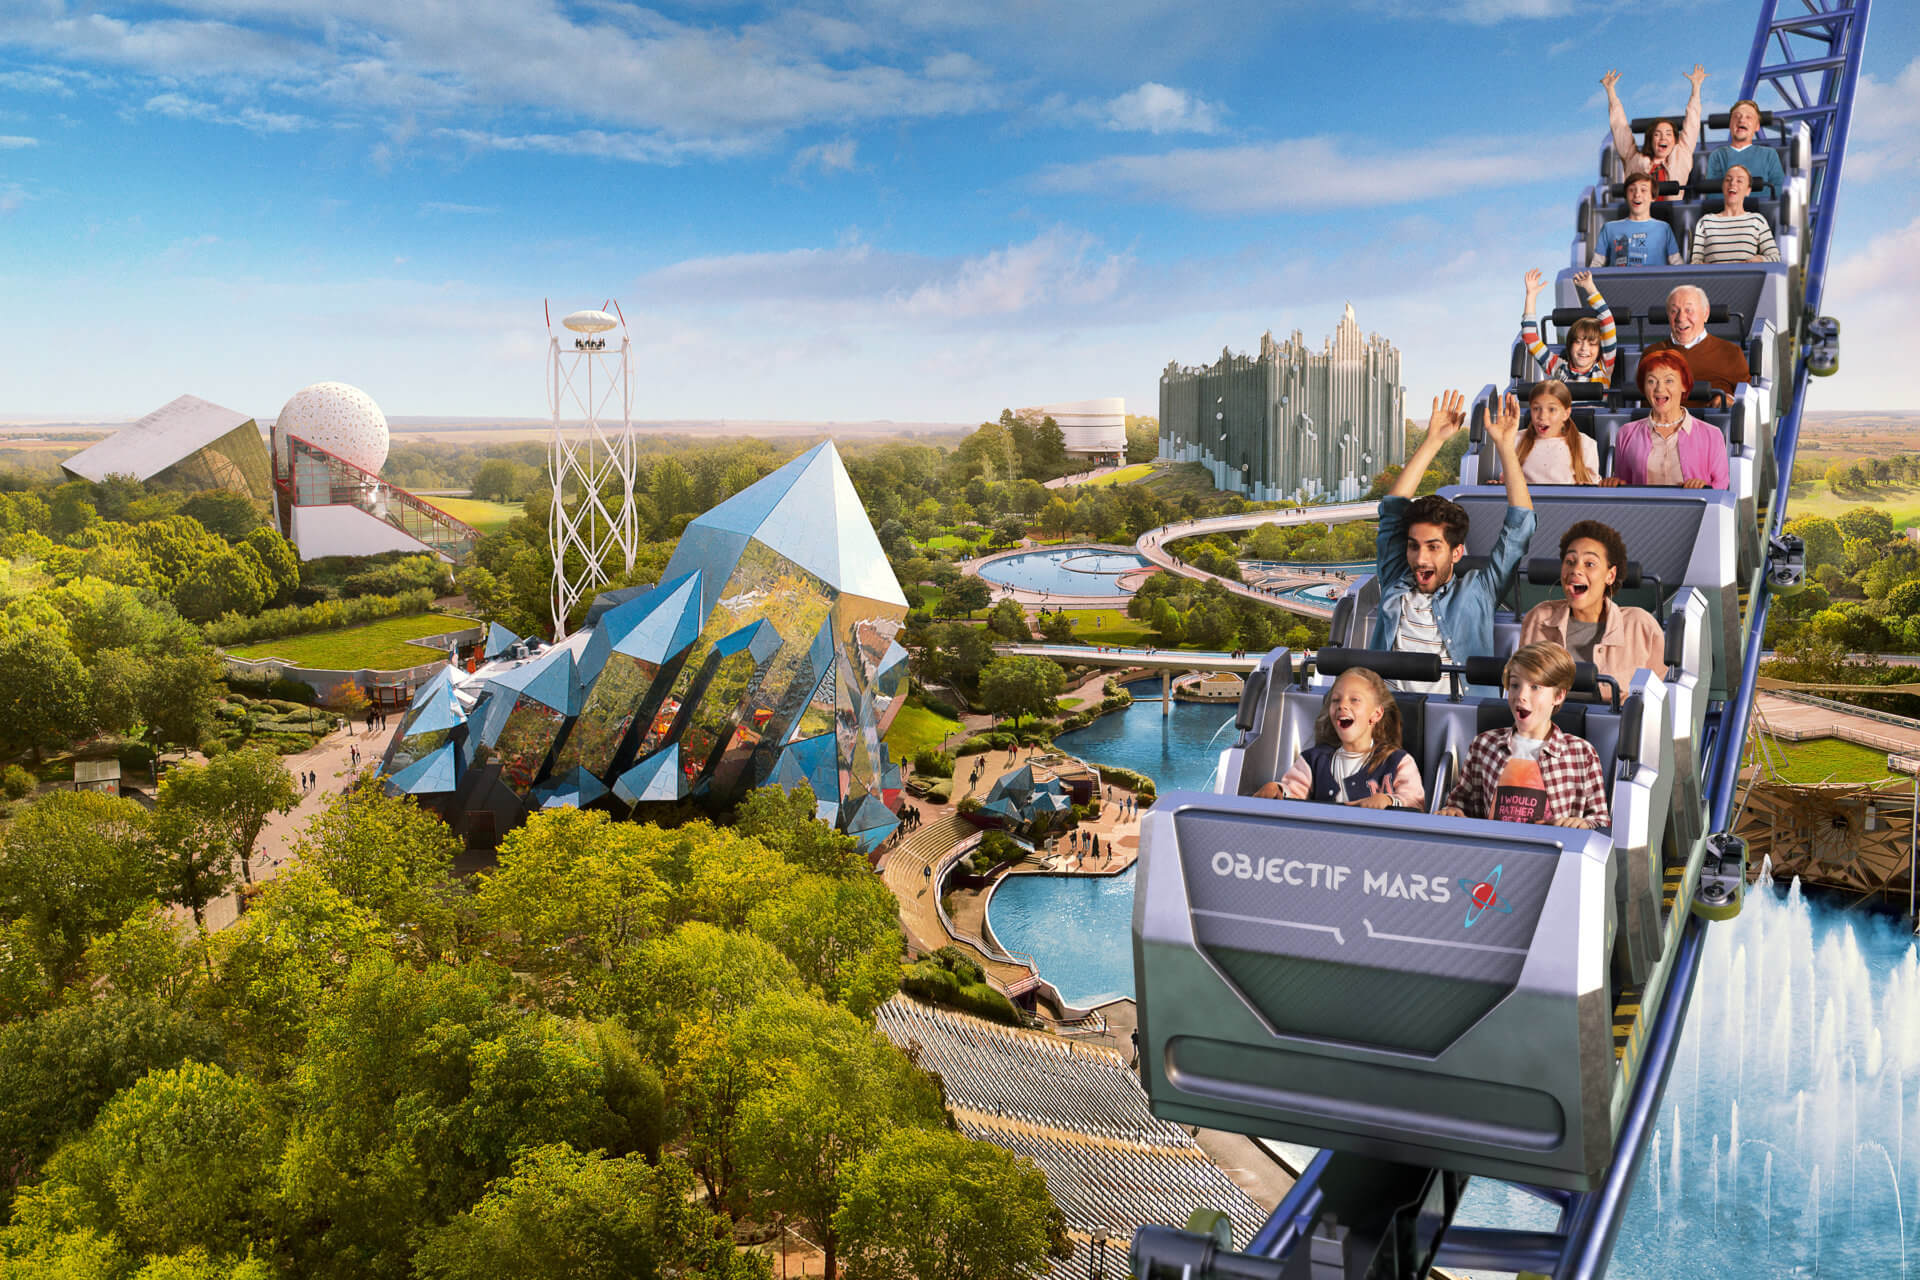 parc attraction france carte objectif mars futuroscope 2020